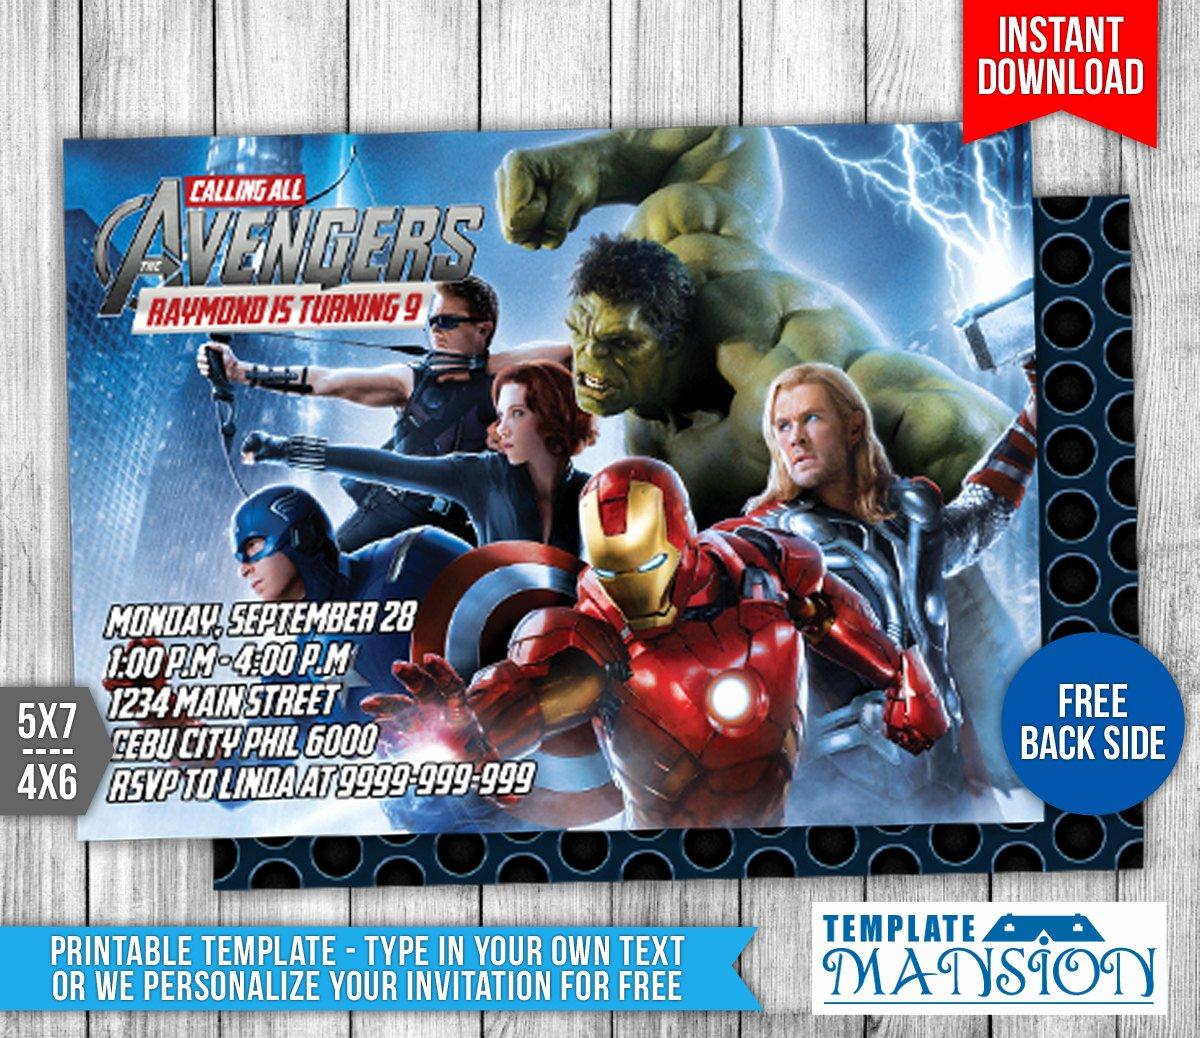 Avengers Birthday Invitations Custom Inspirational Avengers Birthday Invitation 1 by Templatemansion On